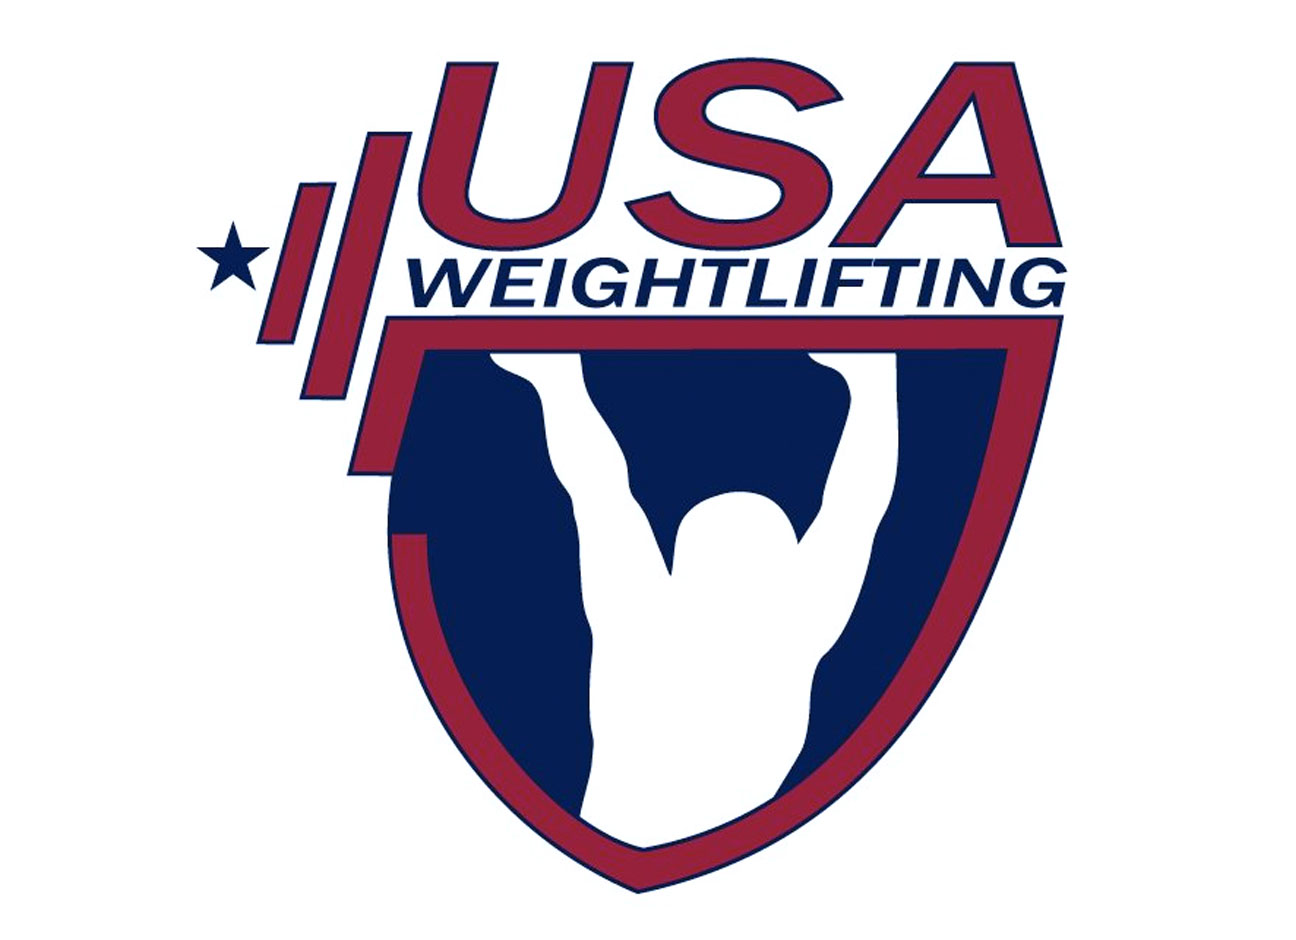 USA Weightlifting - Las Vegas International Open 2019 Weightlifting